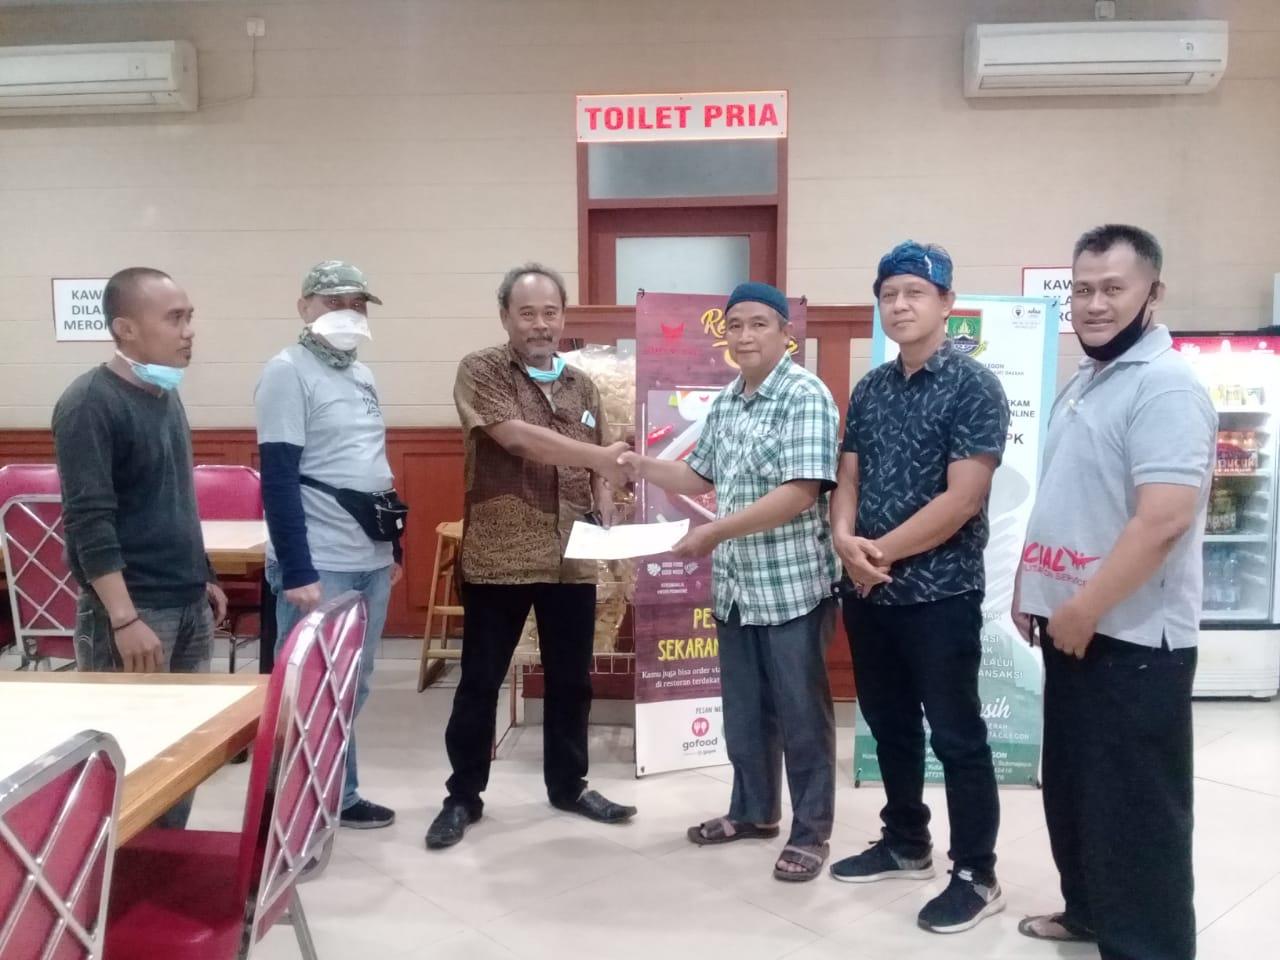 Jum'at, 29 Janurai 2021 Serah Terima Orang Terlantar dengan Pihak Keluarga di Serang